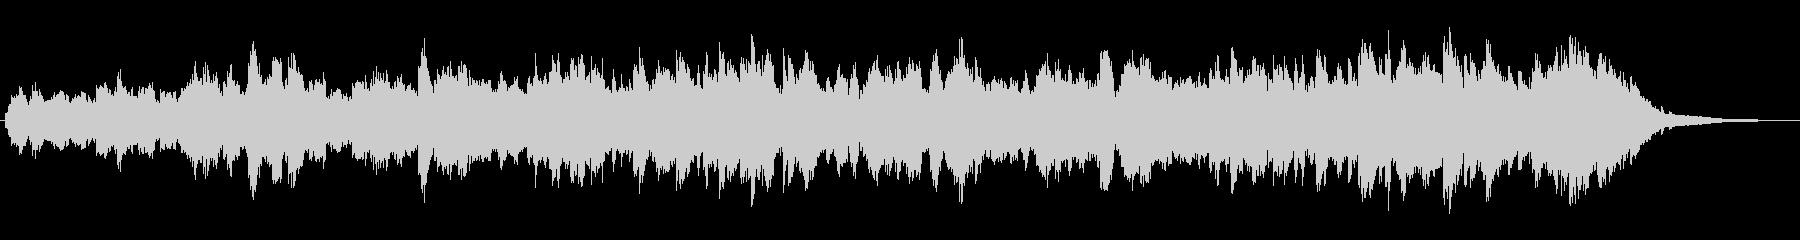 CMや映像に/ピアノ/優しい/感動/F#の未再生の波形